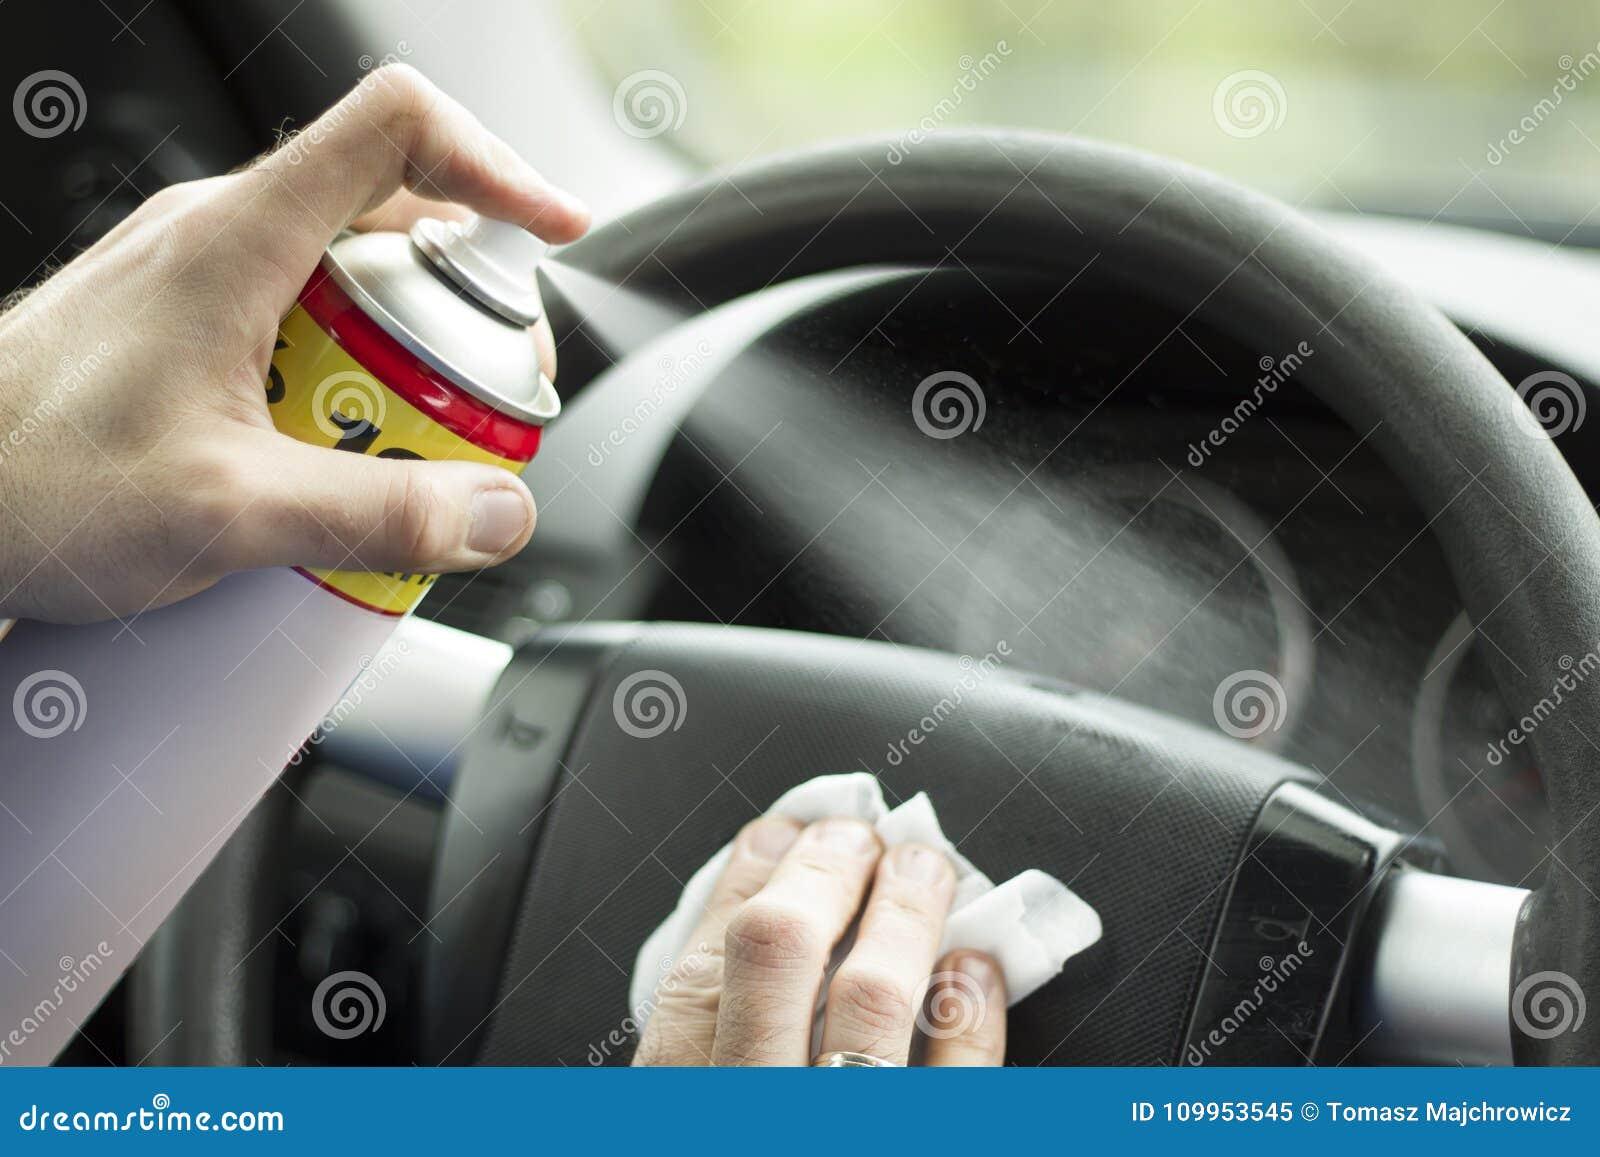 Рука ` s человека прикладывает брызг rinse на арене автомобиля